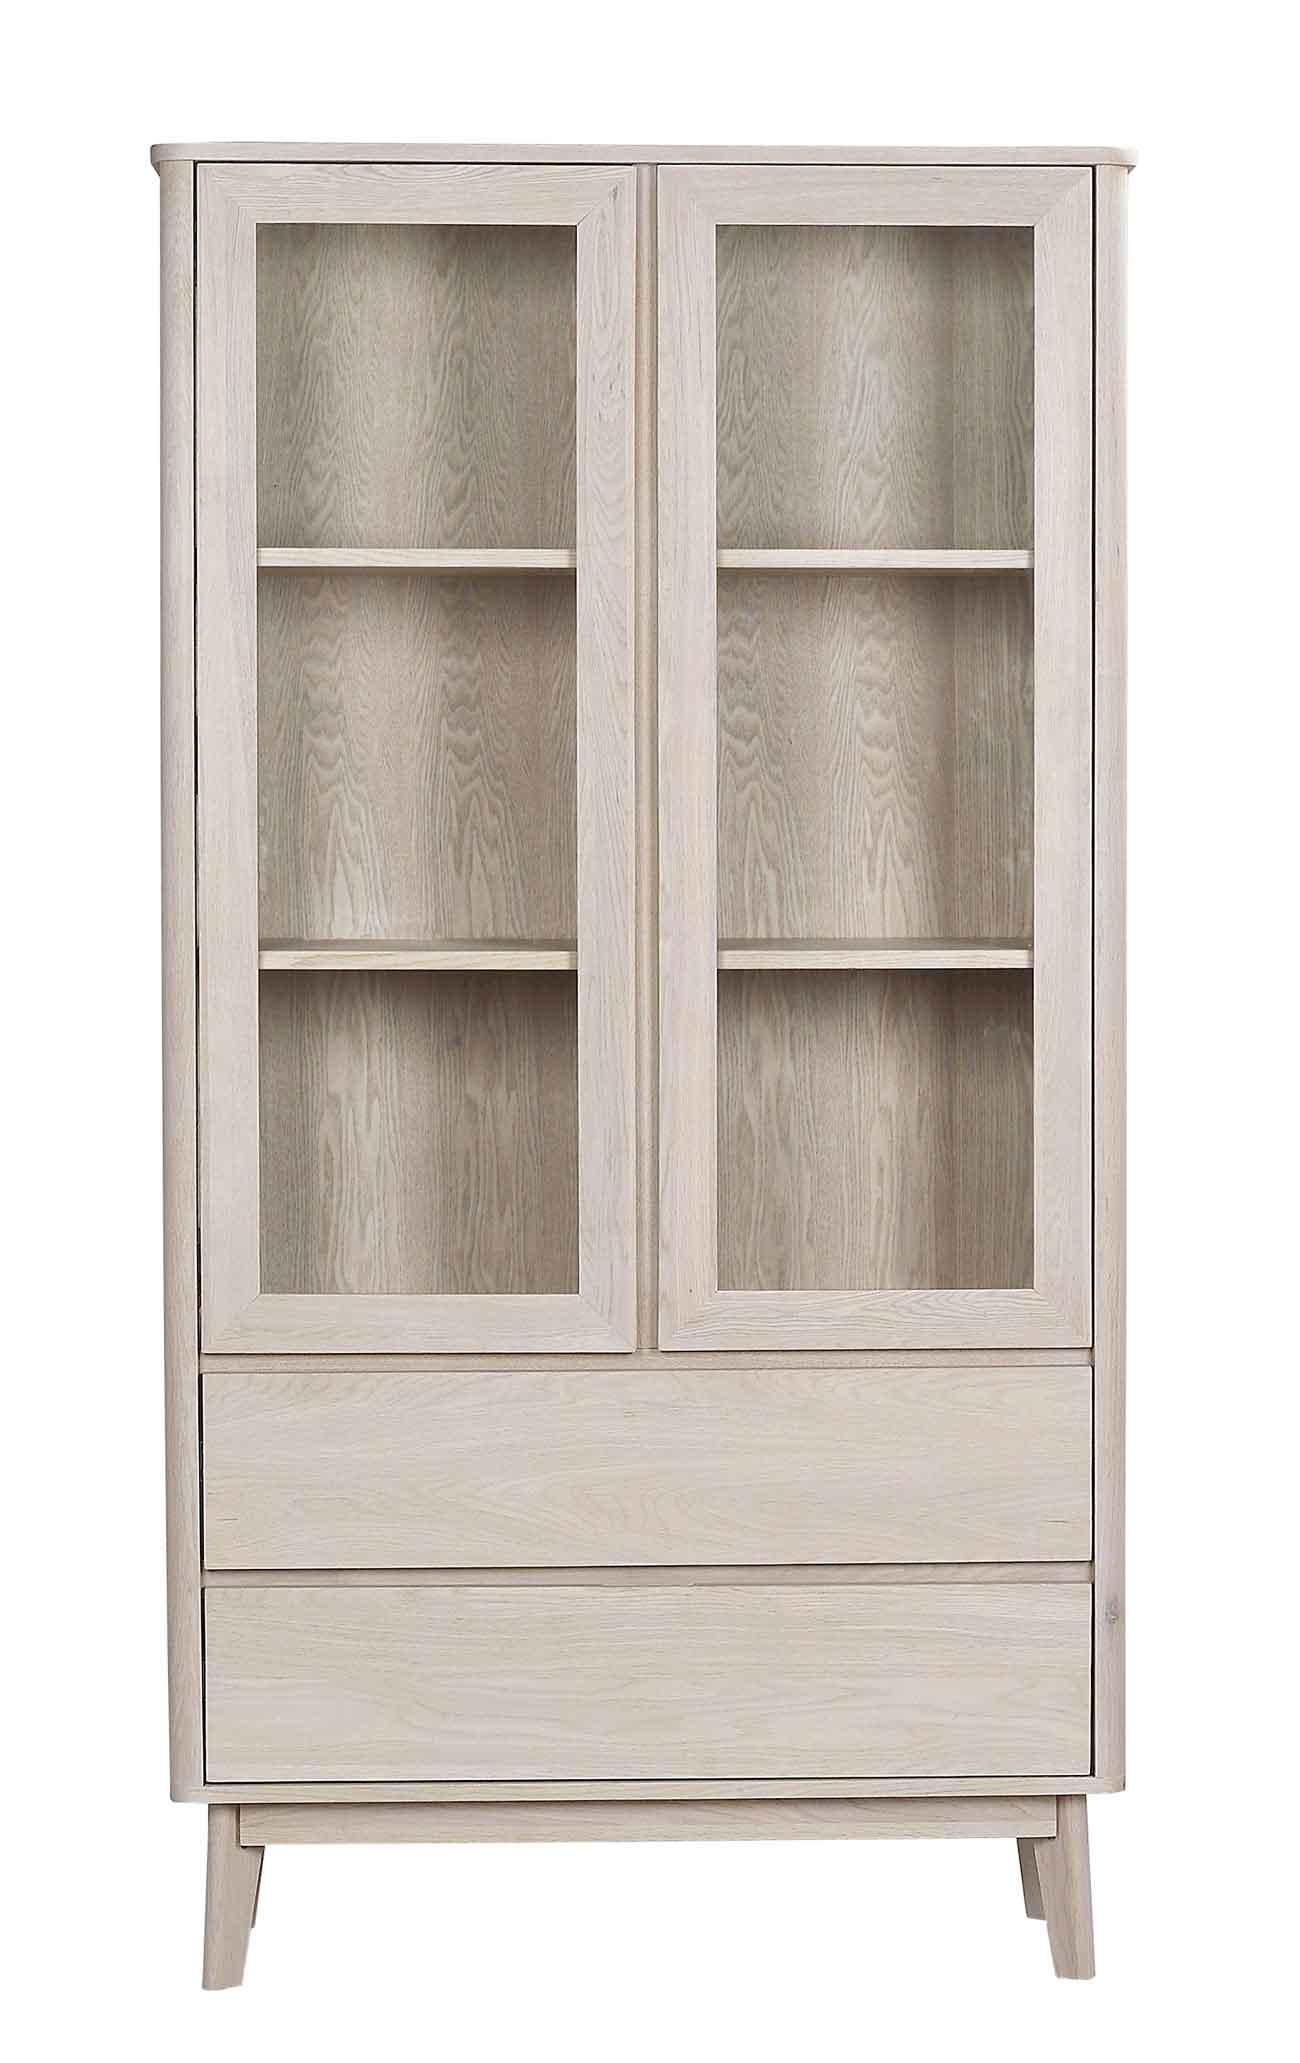 Yumi vitrineskab - Hvidpigmenteret egetræ, 2 låger/2 skuffer